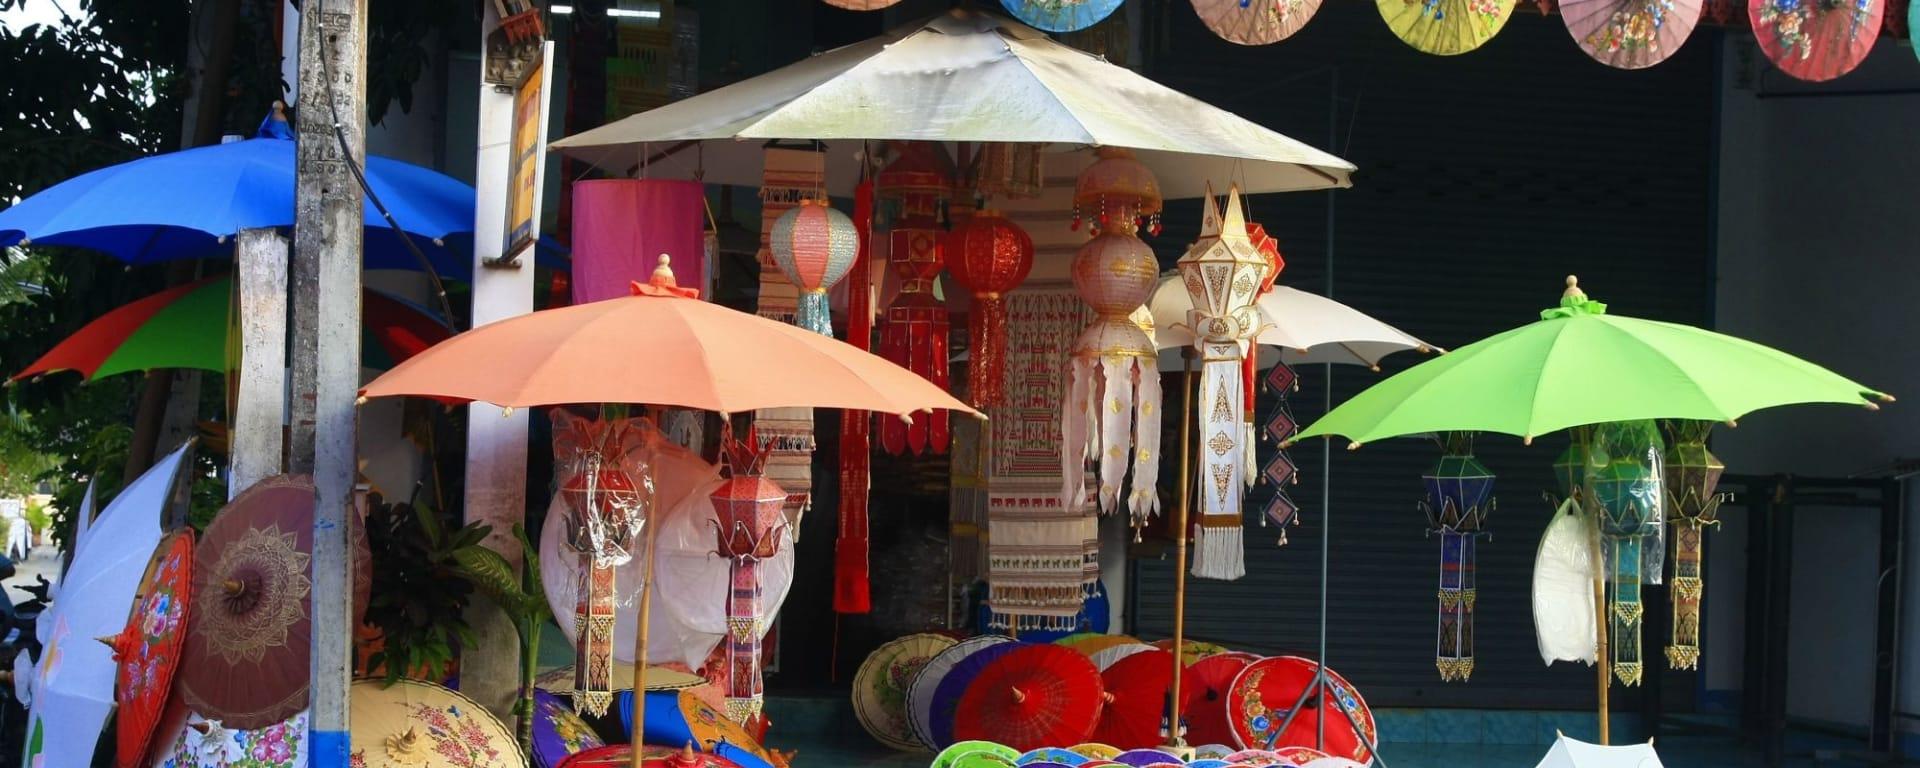 Chiang Mai City mit Doi Suthep: Chiang Mai Umbrella Shop